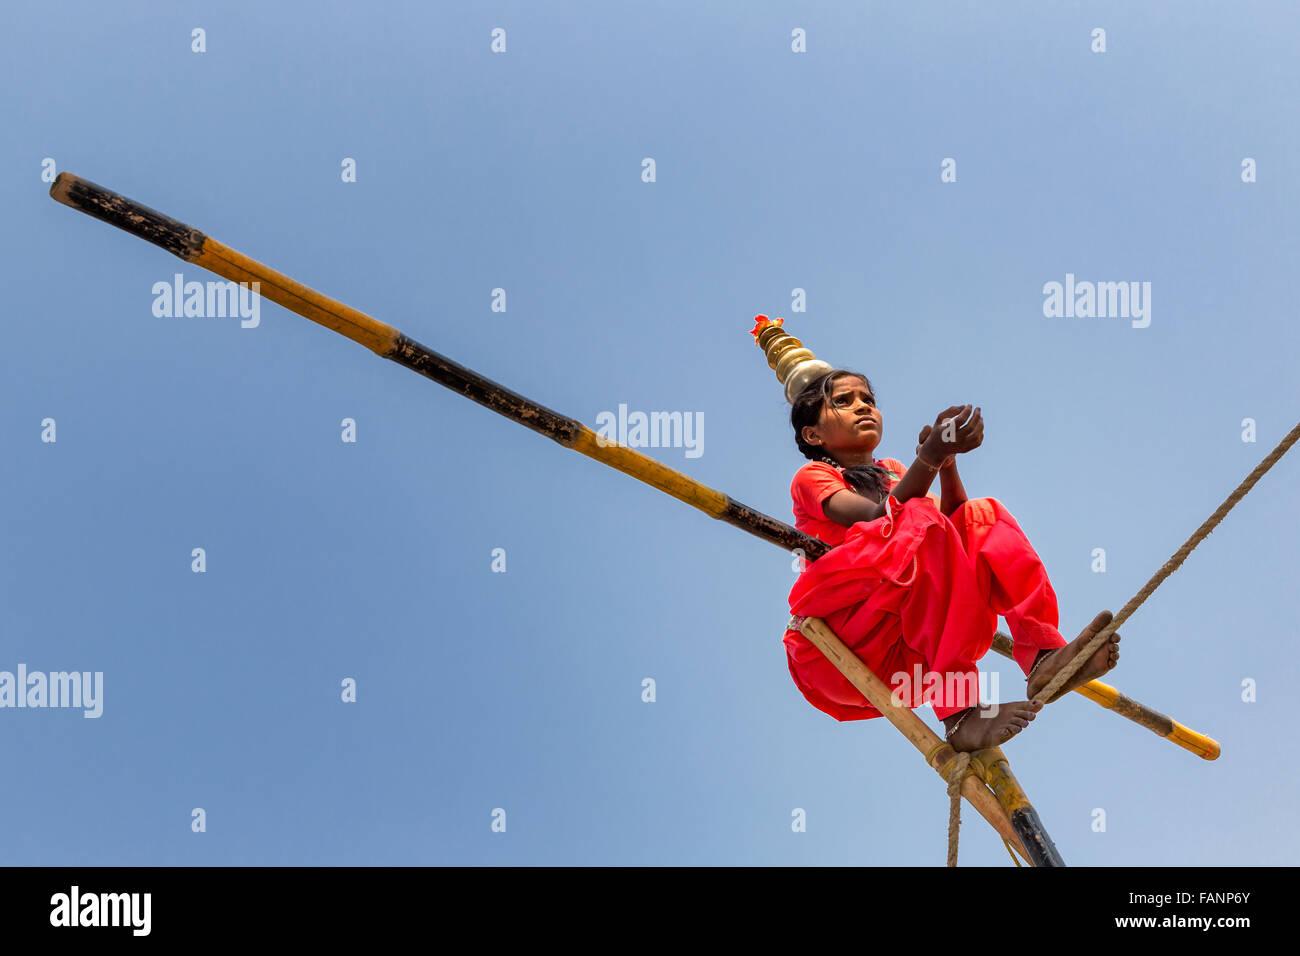 Bambino corda walker, Pushkar, Rajasthan, India Immagini Stock